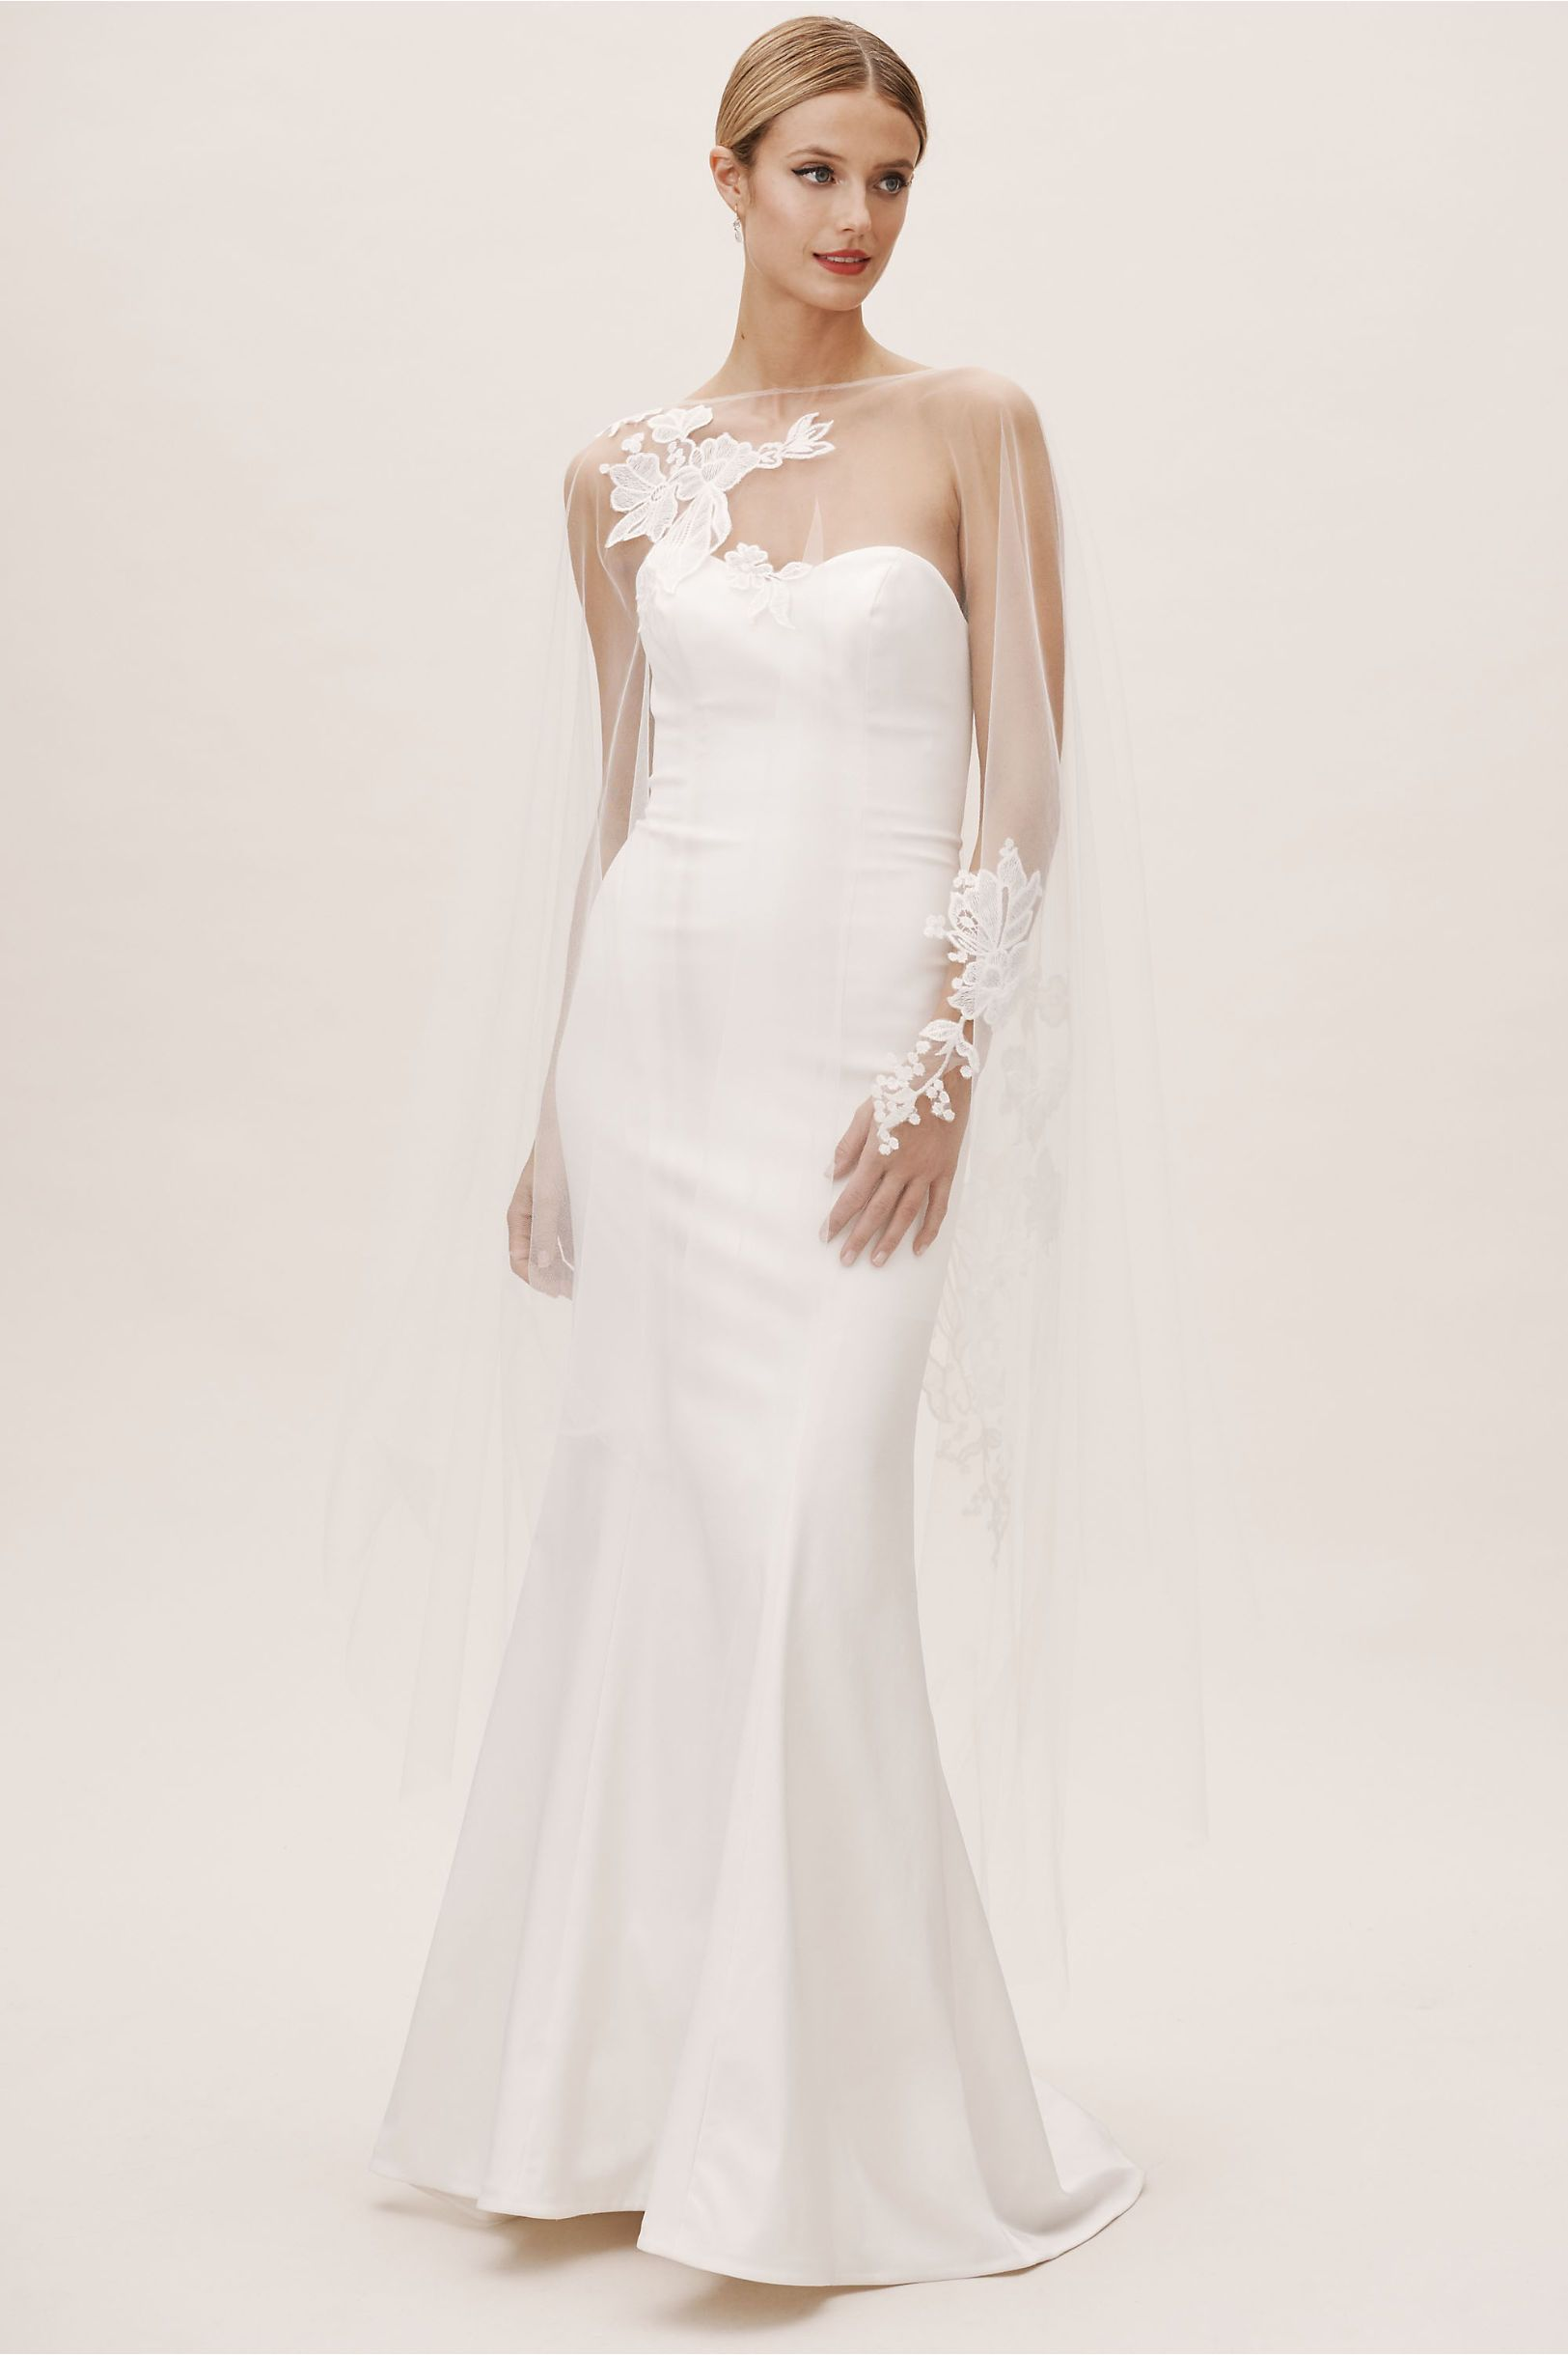 Amsale Inaya Cape Making A Wedding Dress Classic Wedding Dress